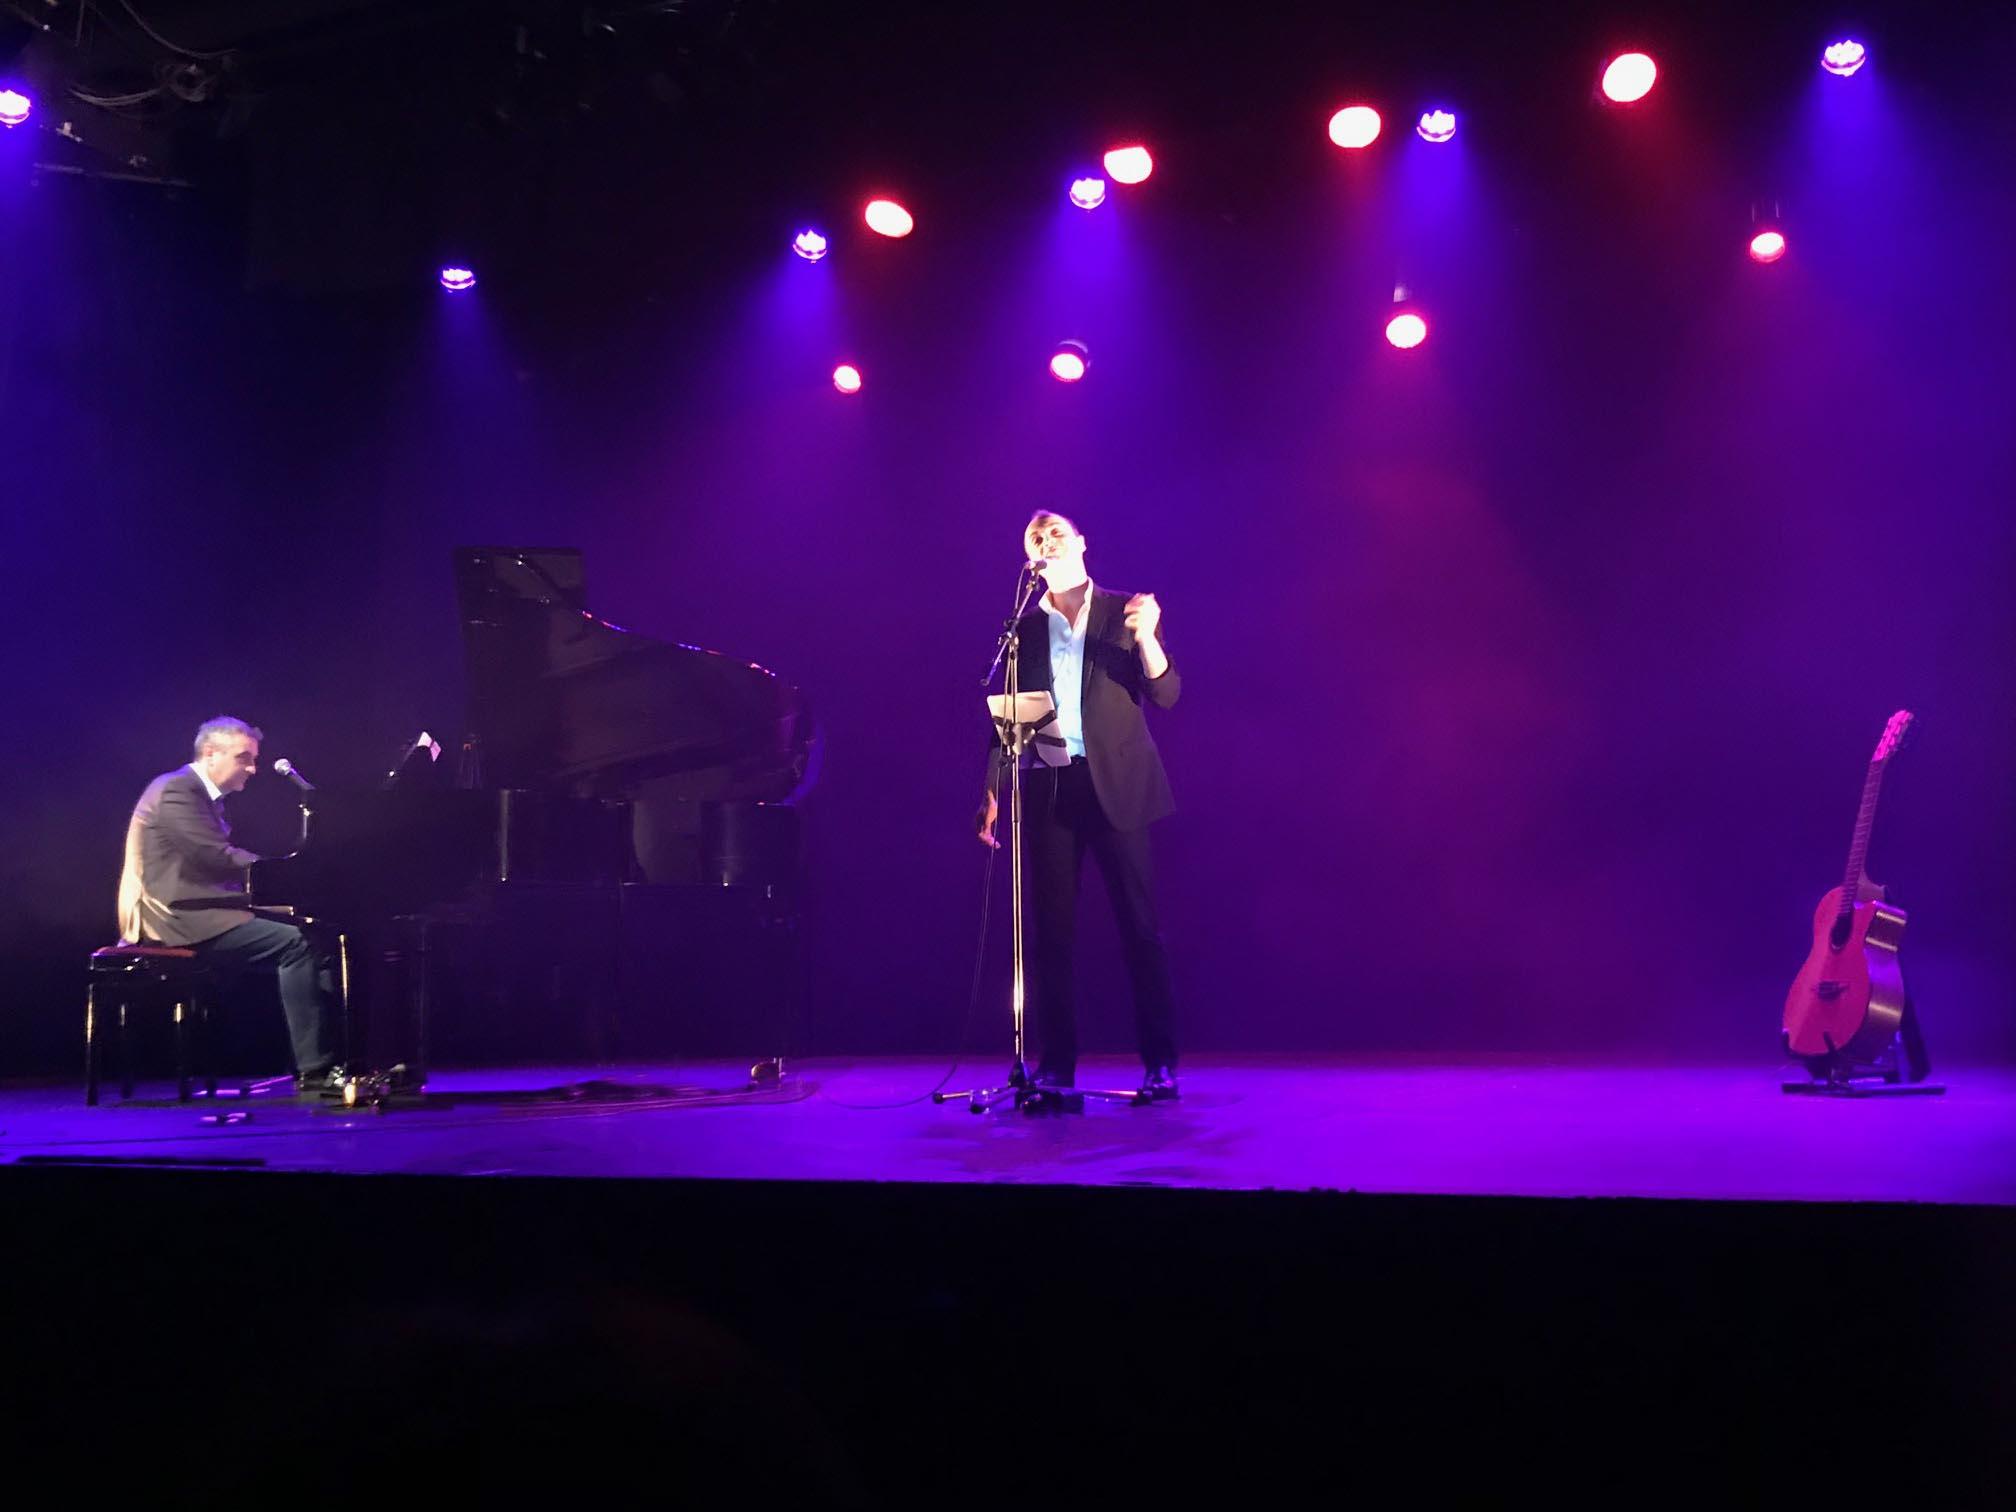 michel-berger-celui-qui-chante-viano-concert